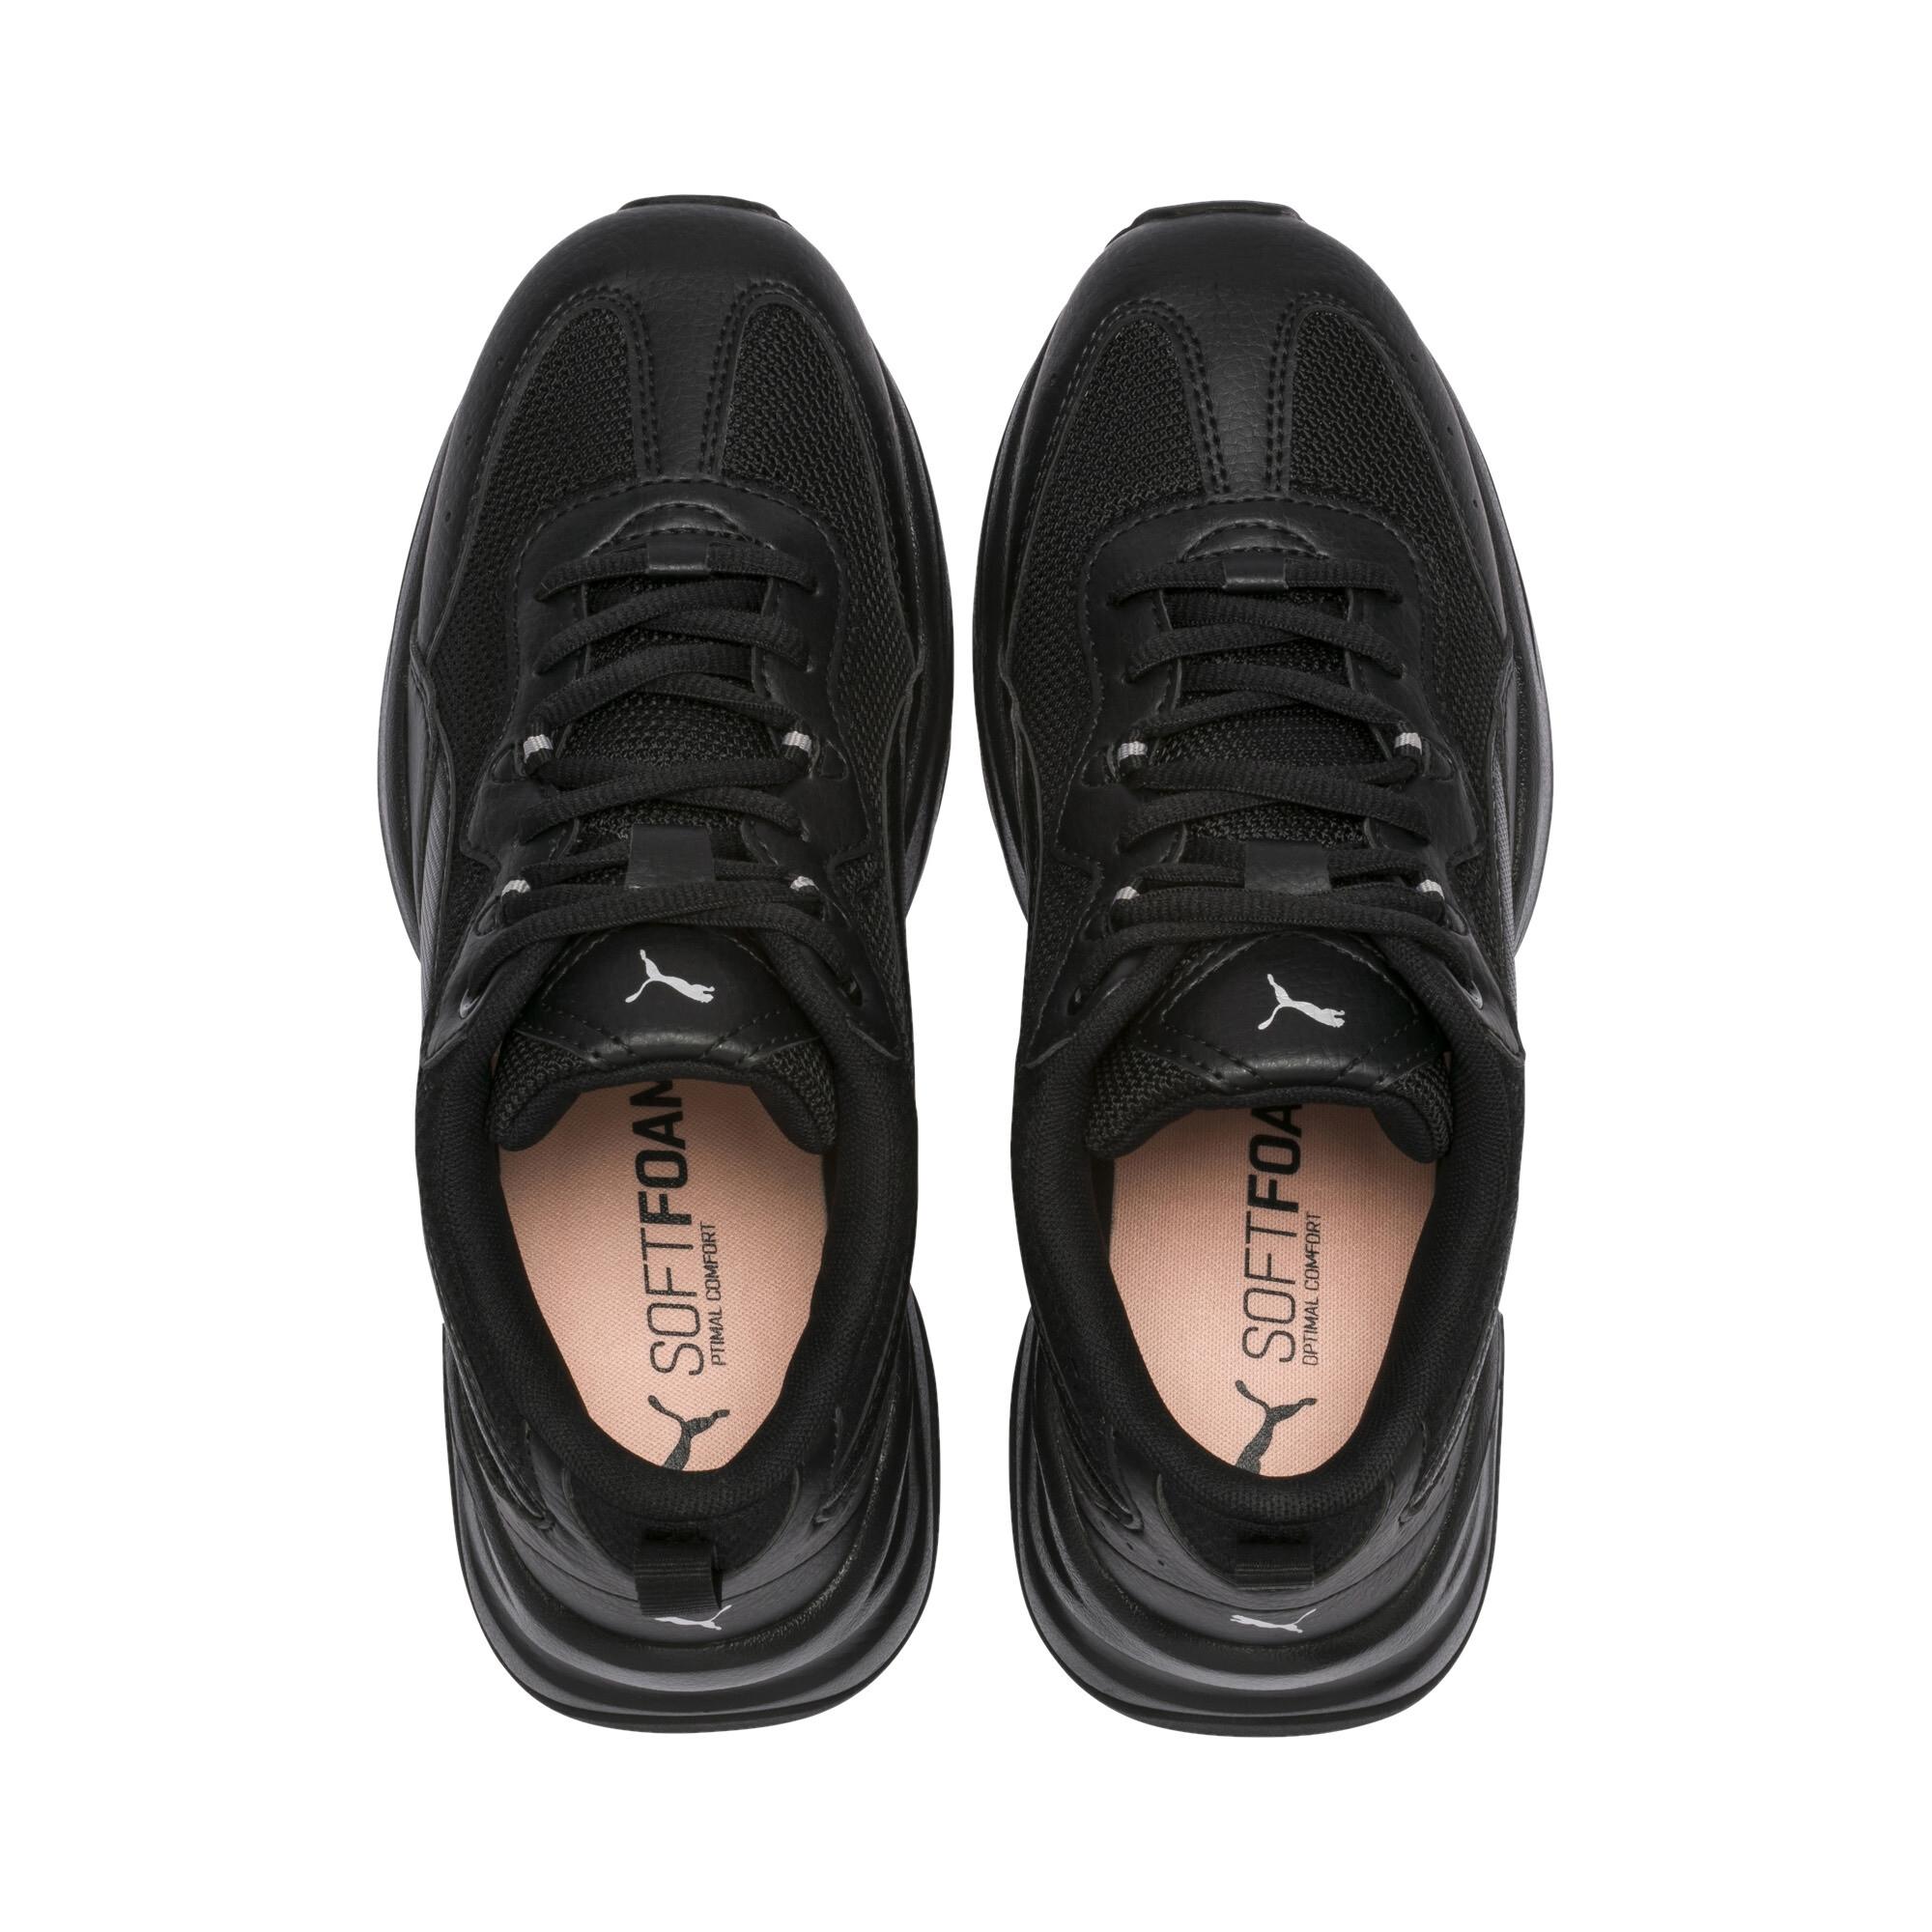 PUMA-Cilia-Women-039-s-Sneakers-Women-Shoe-Basics thumbnail 13